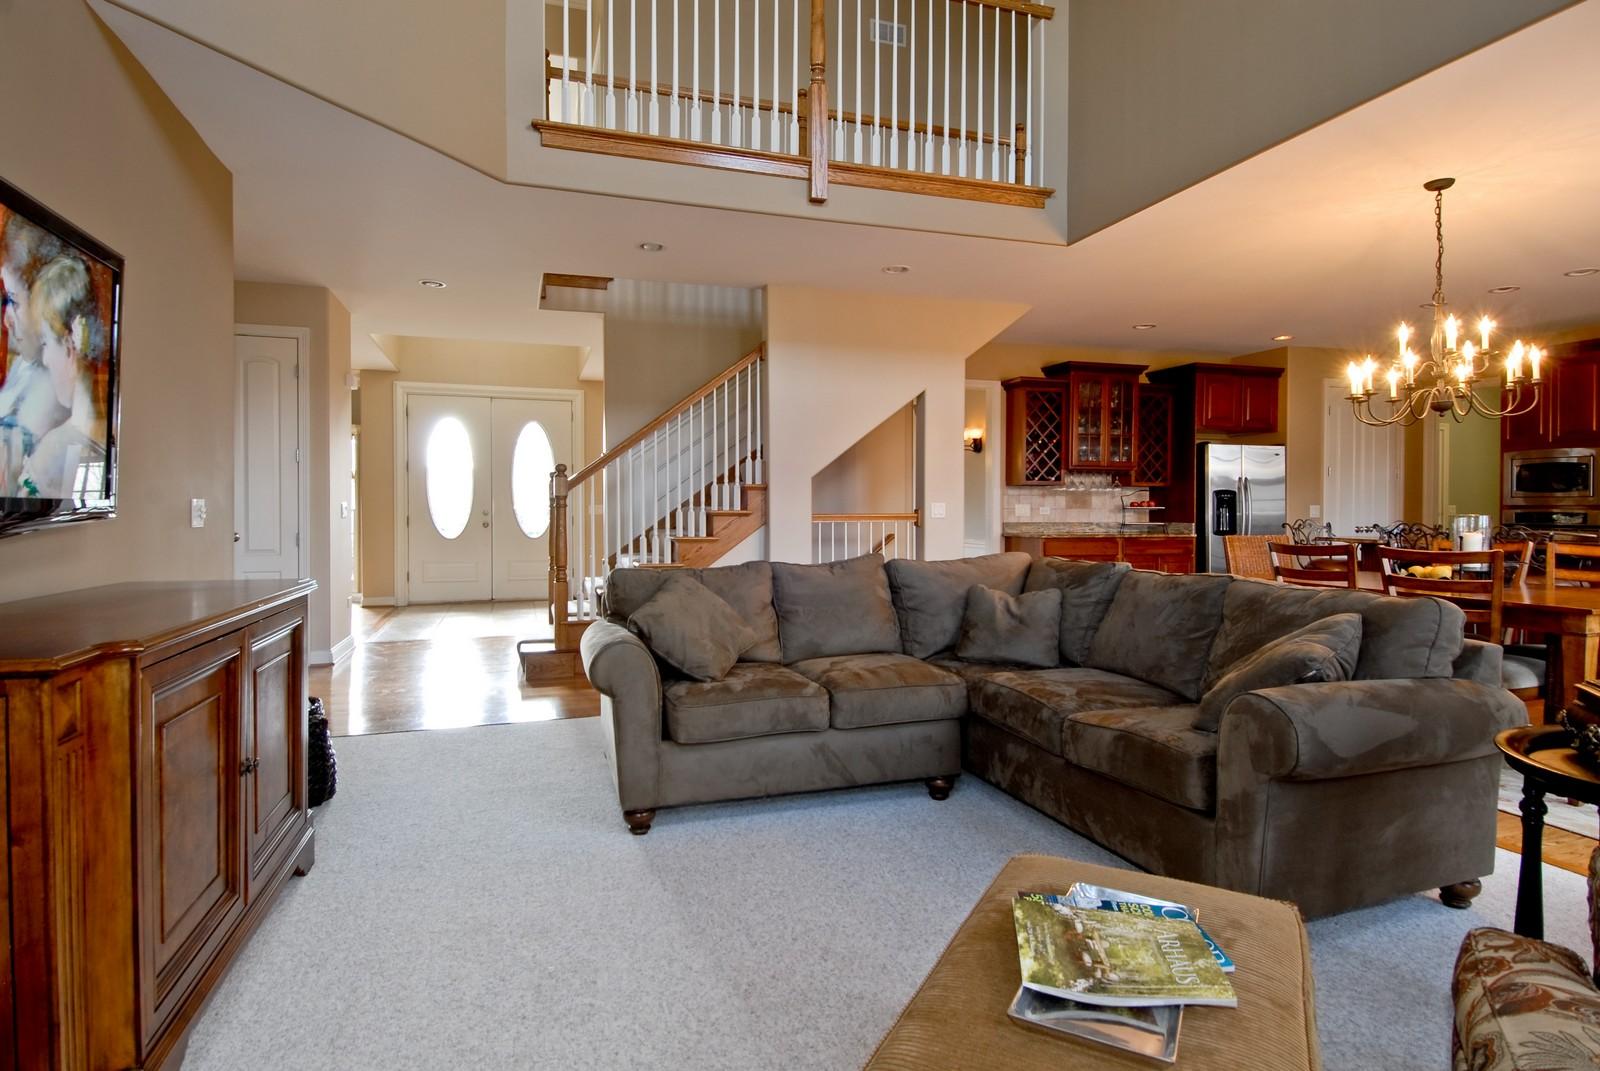 Real Estate Photography - 3839 Junebreeze Ln, Naperville, IL, 60564 - Location 1